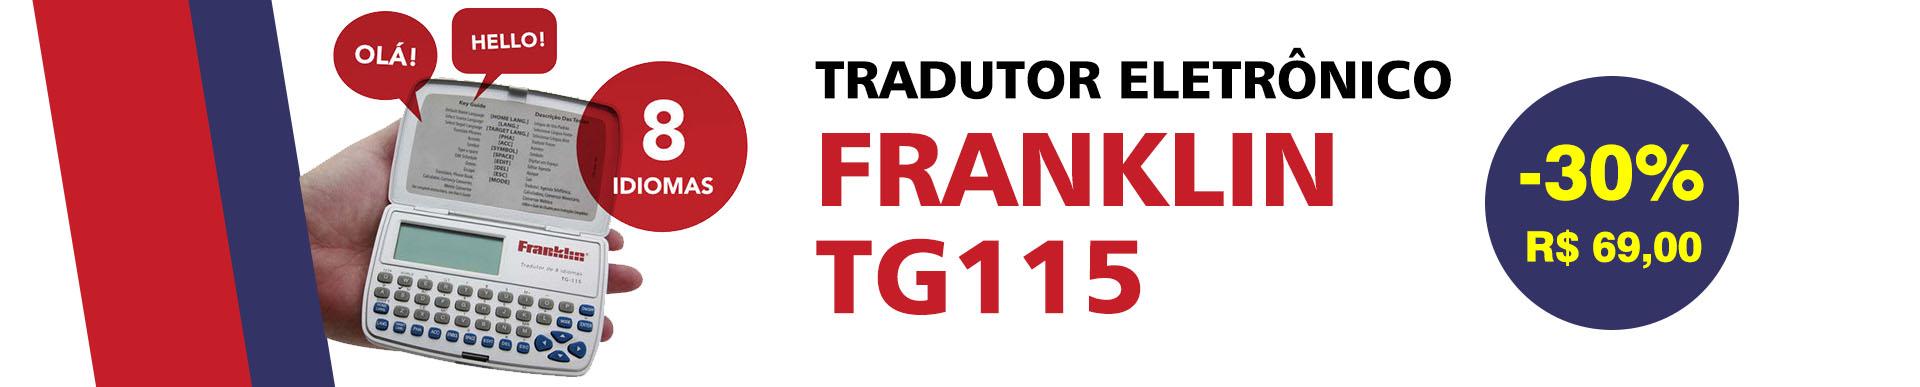 Tradutor Franklin TG115